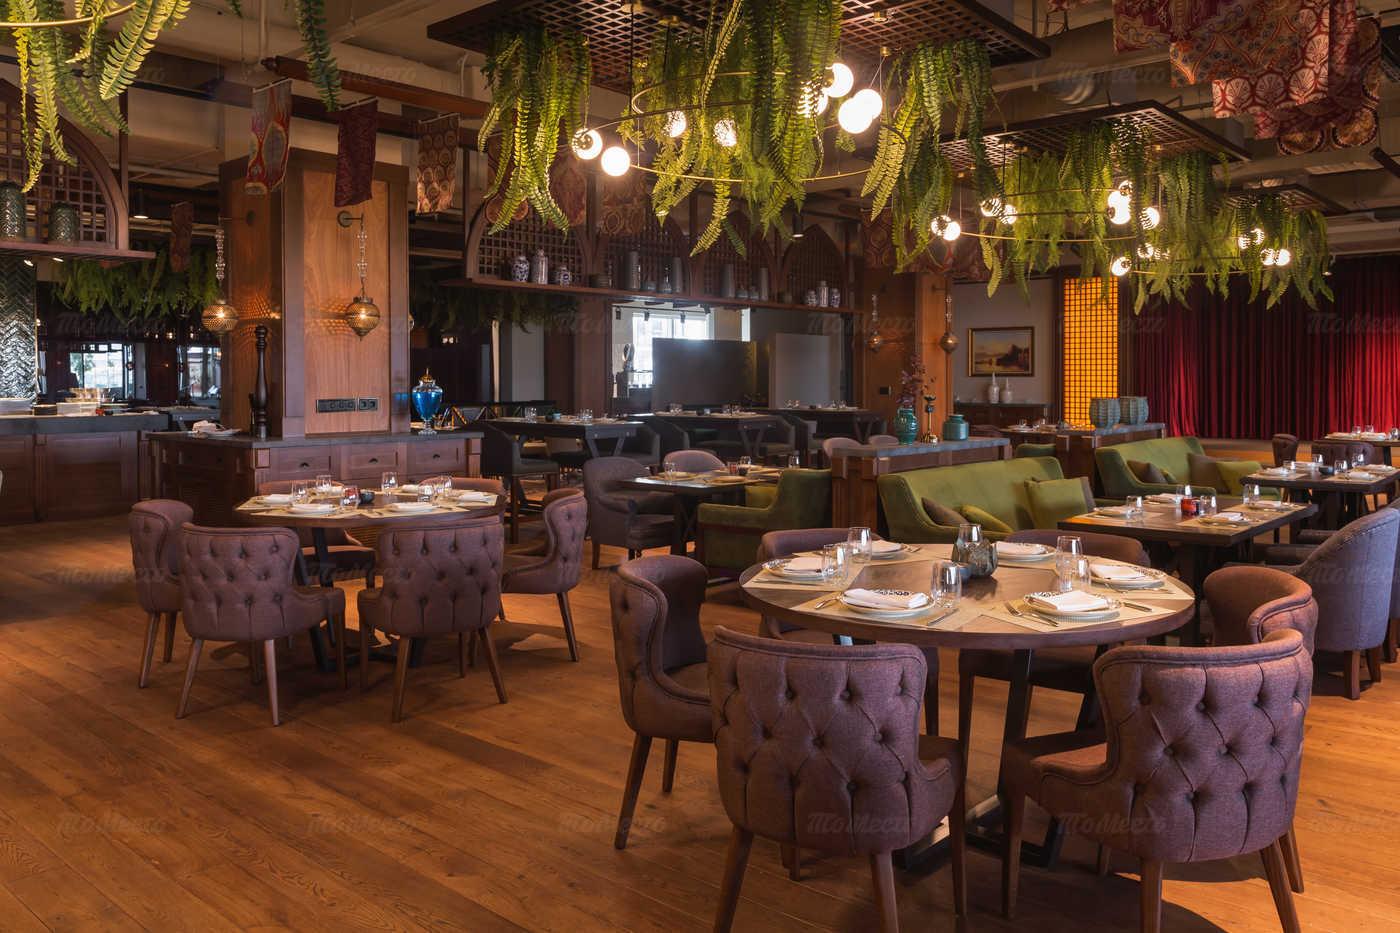 Ресторан Левантин (Levantine) на Новинском бульваре фото 21